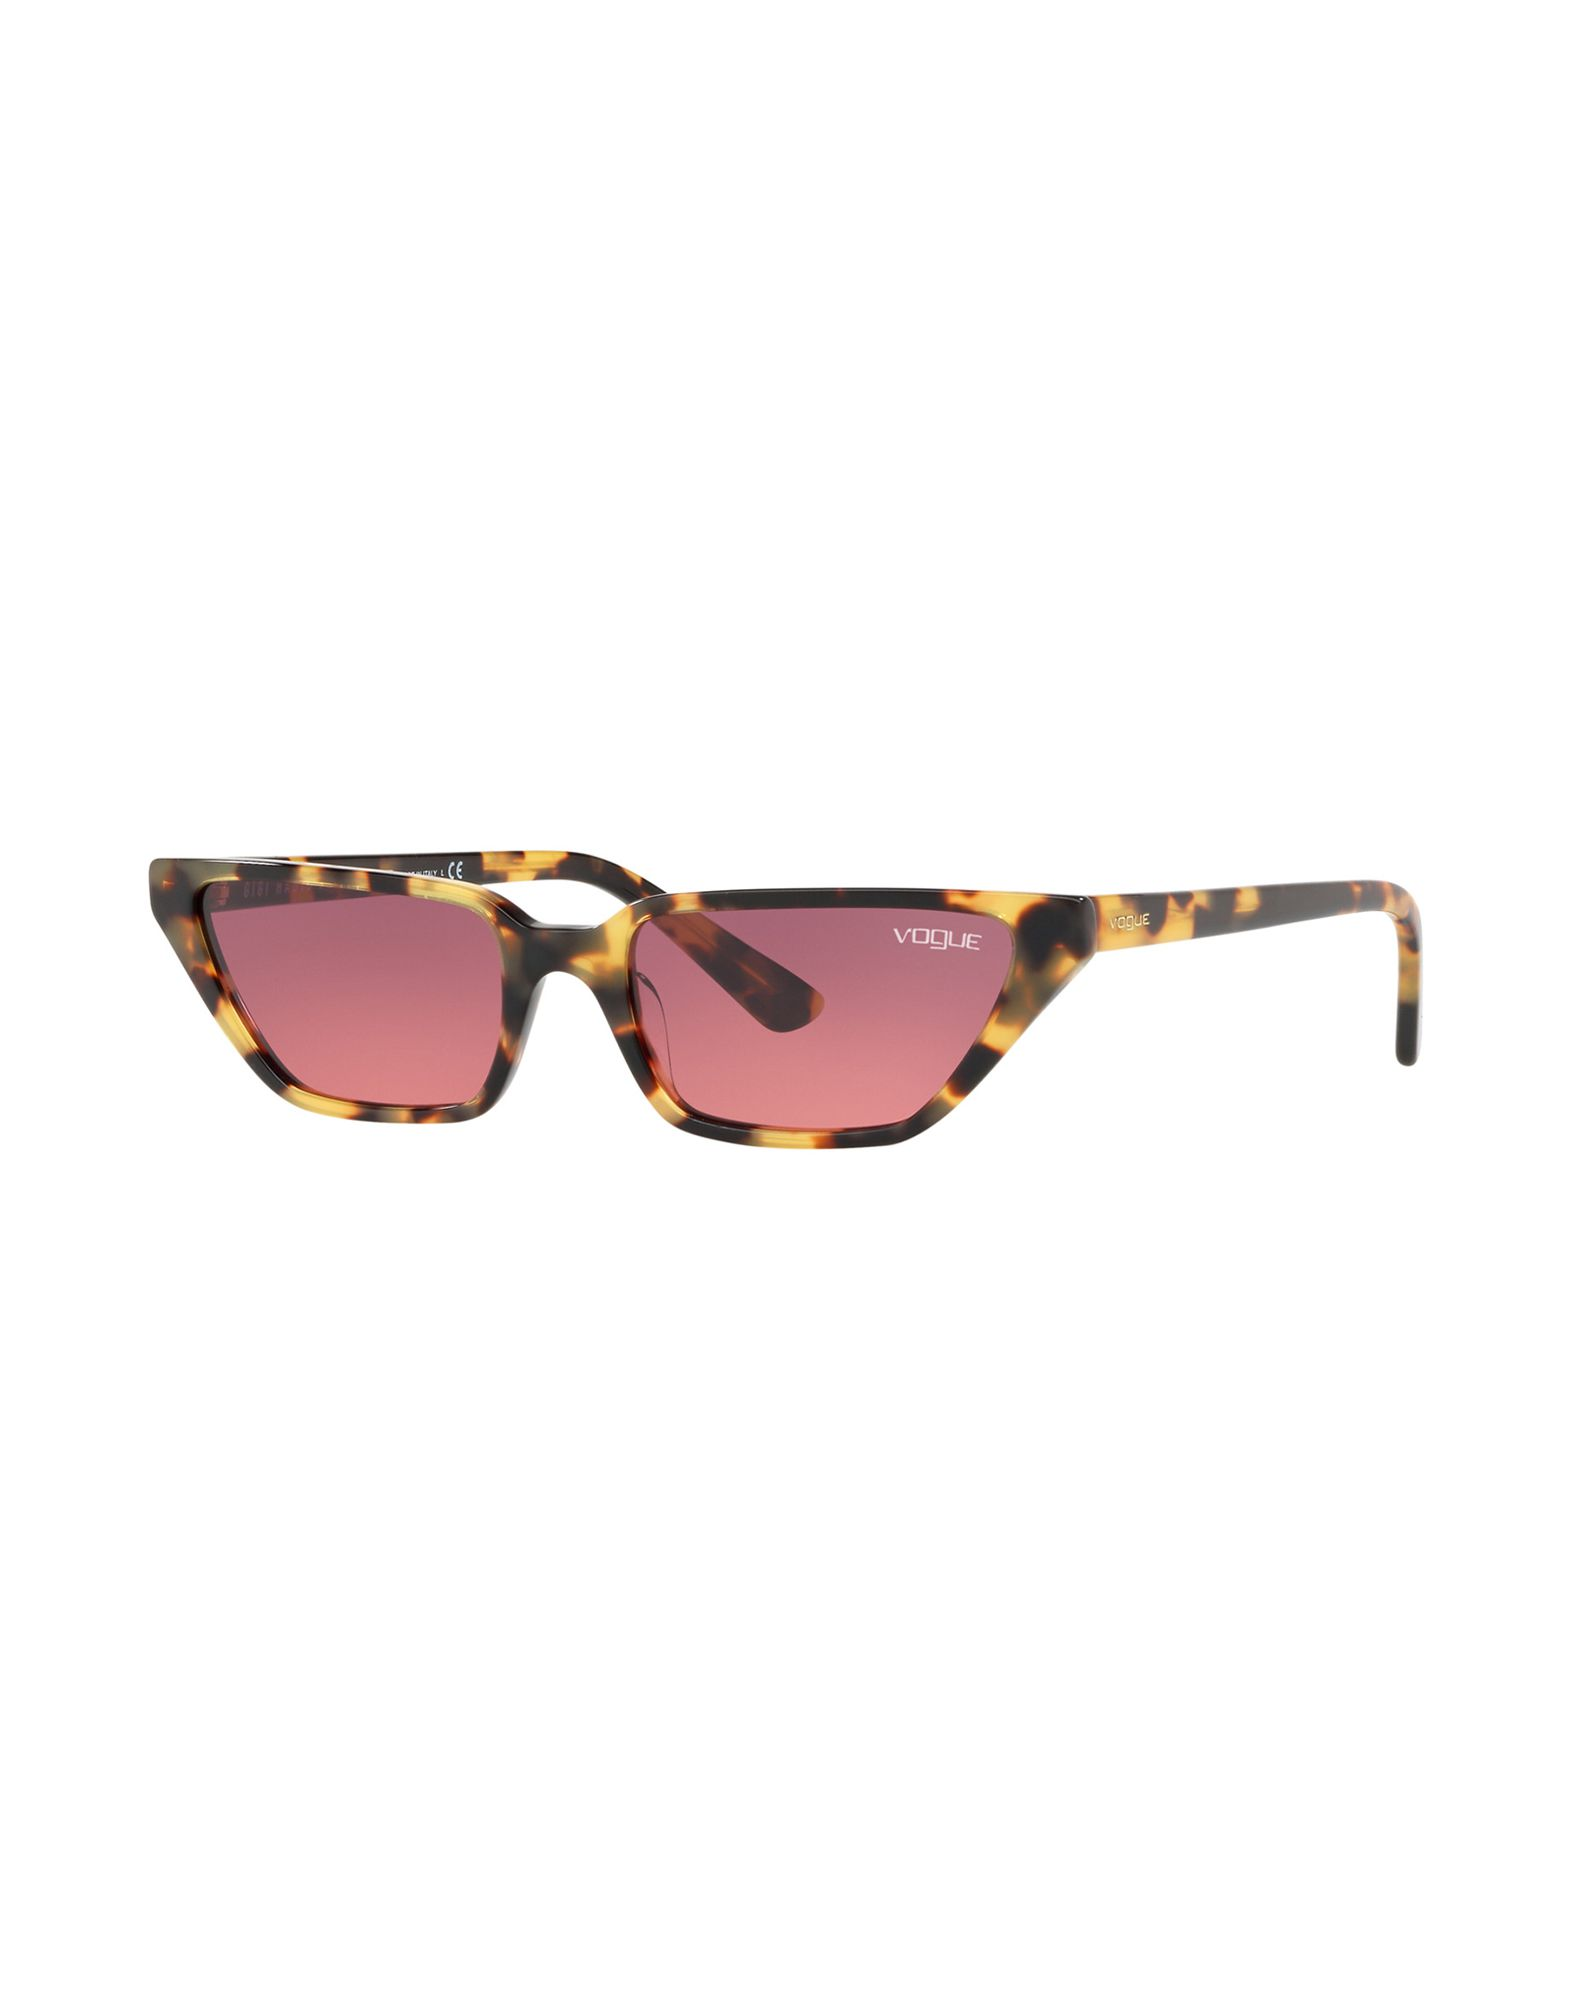 32fa01a1dd Γυαλιά Ηλίου Gigi Hadid For Vogue Vo5235s - Γυναίκα - Γυαλιά Ηλίου Gigi  Hadid For Vogue στο YOOX - 46584799DL